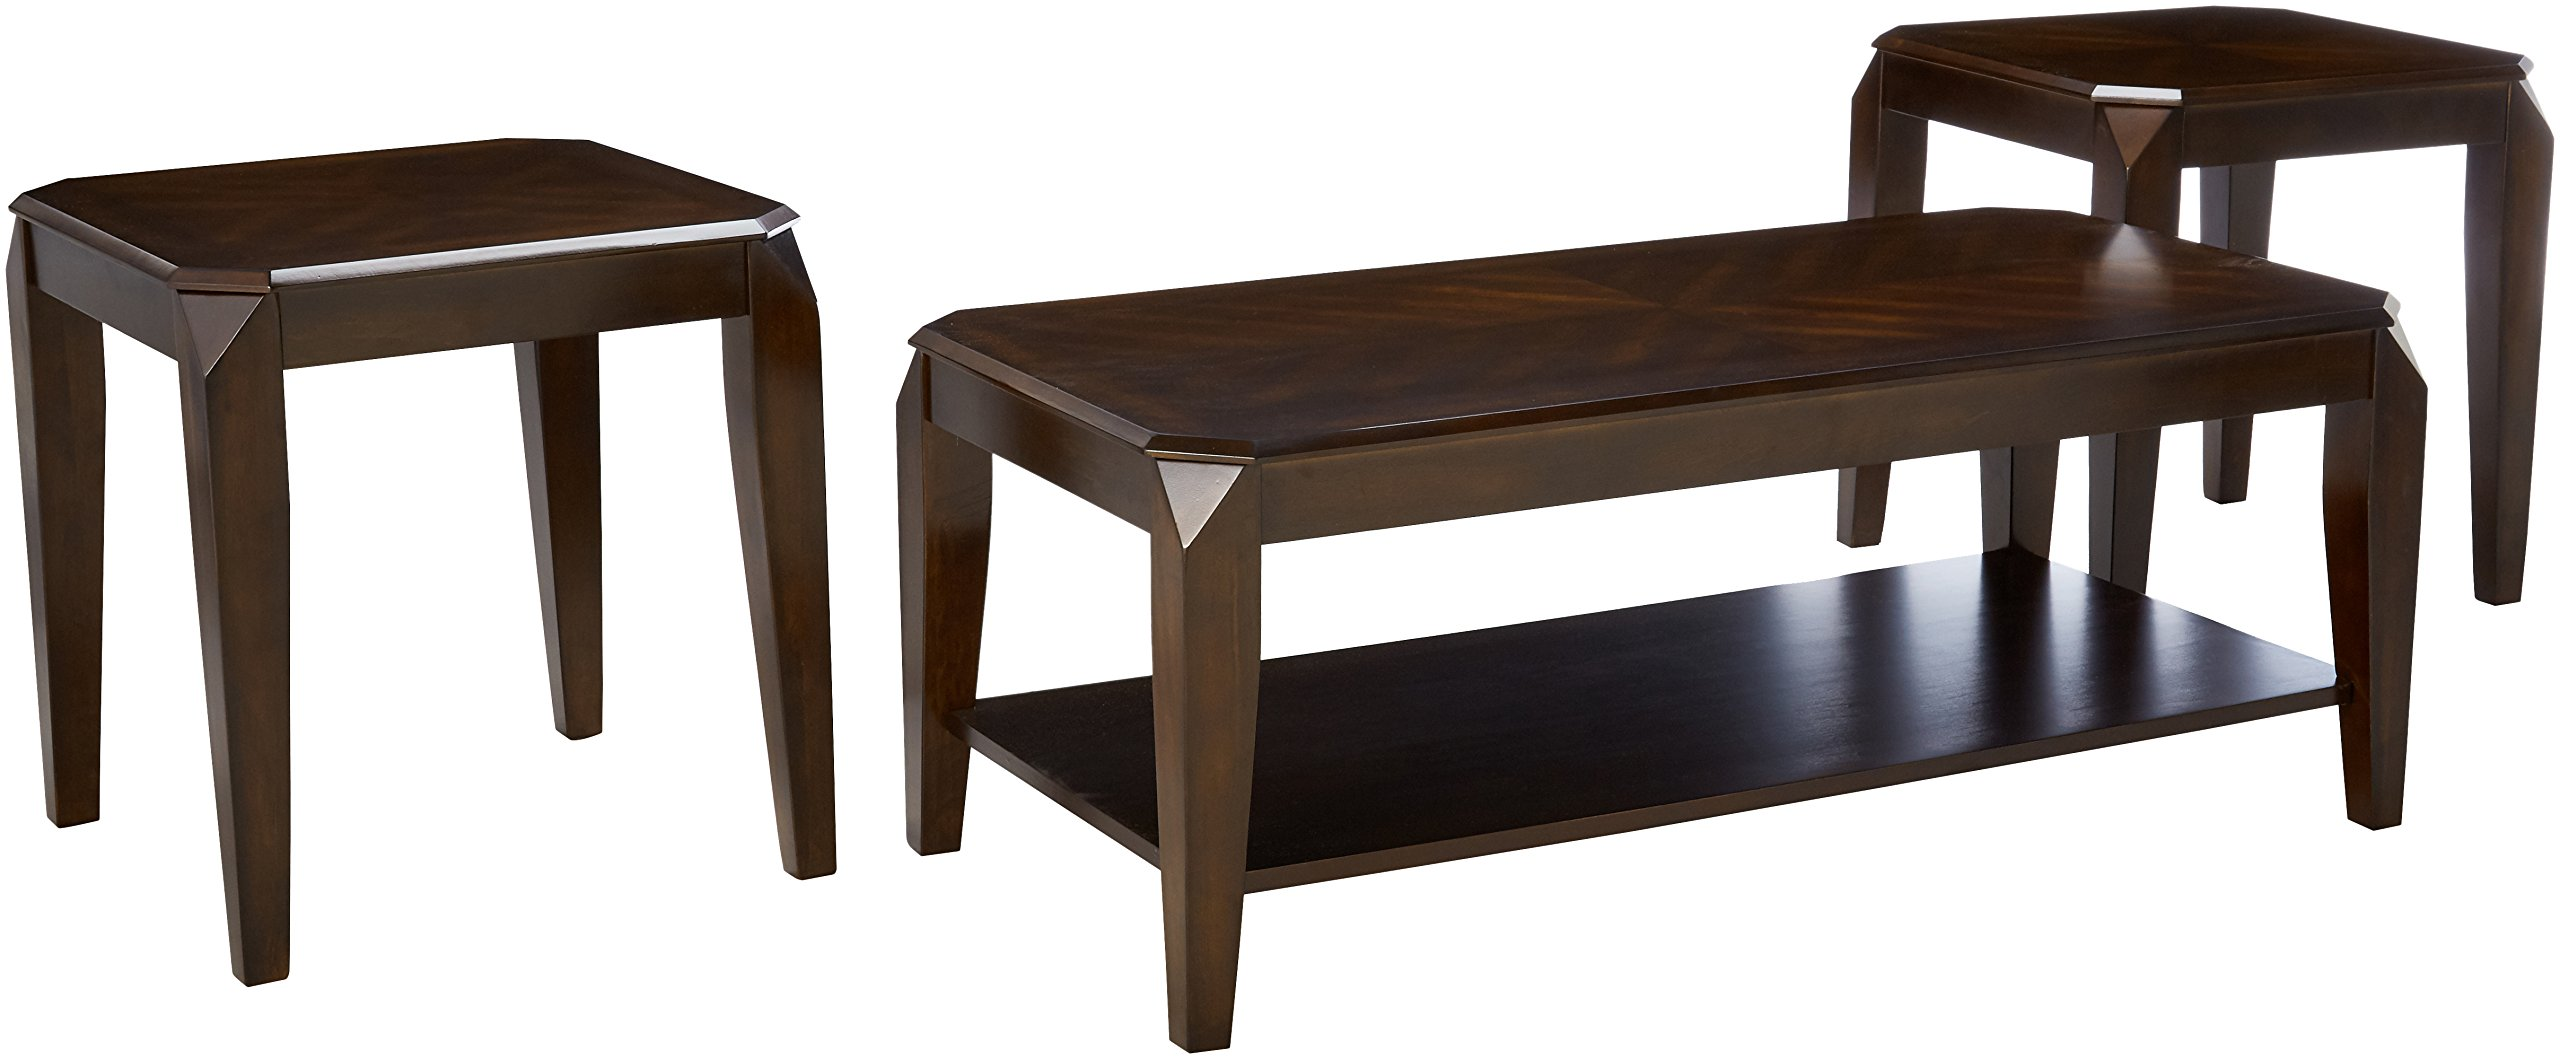 ACME Furniture Docila 3Piece Coffee End Table Set, Walnut by Acme Furniture